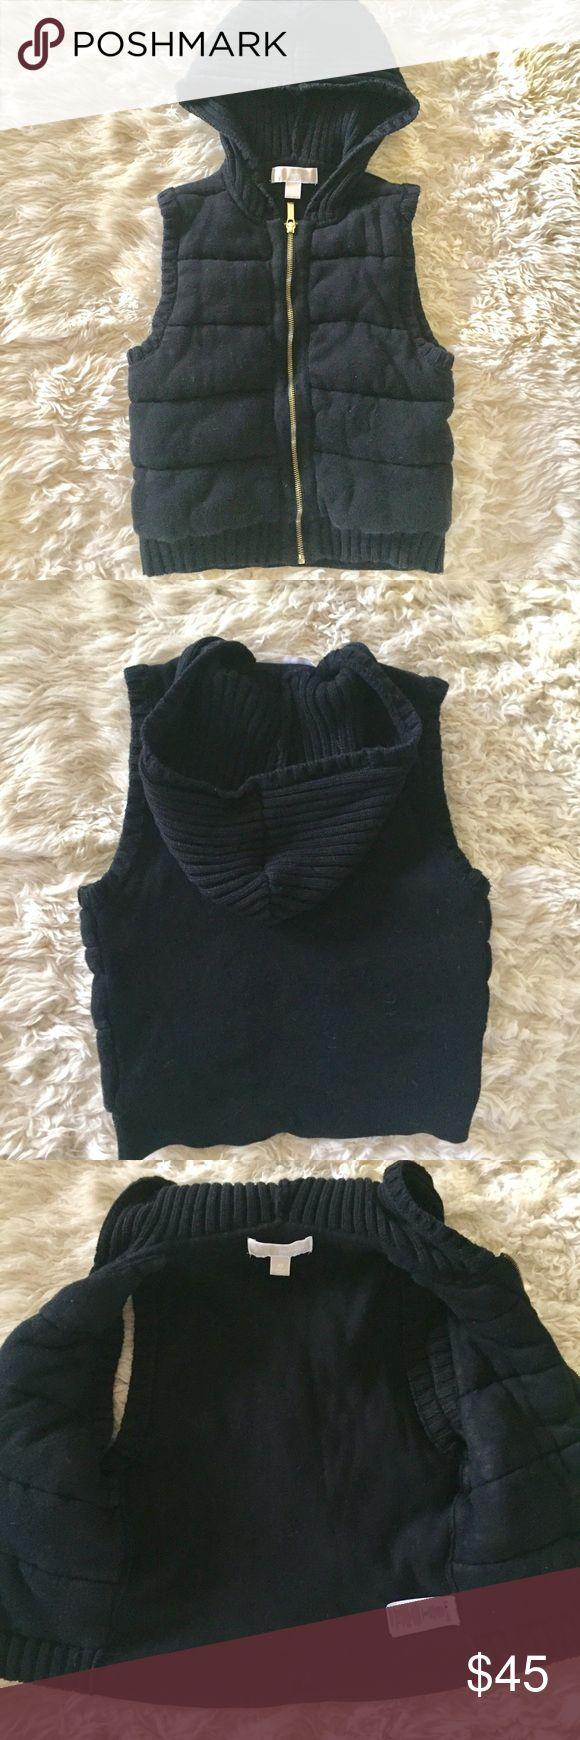 MICHAEL KORS HOODED SWEATER VEST Black MICHAEL KORS hooded sweater vest.  Size XS.  Good condition, pet/smoke free home MICHAEL Michael Kors Jackets & Coats Vests